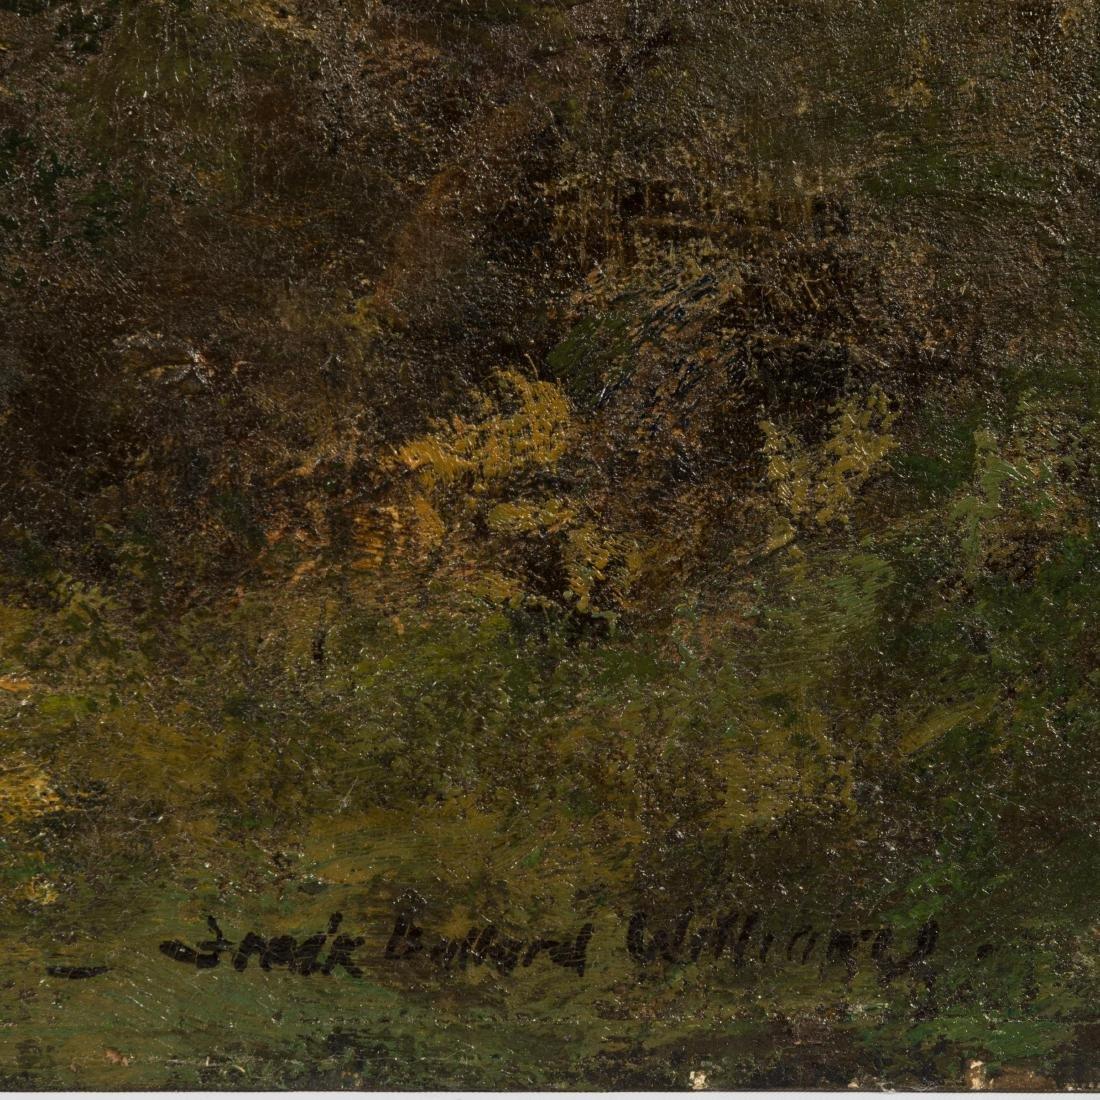 Frederick Ballard Williams - Oil on Board - 4